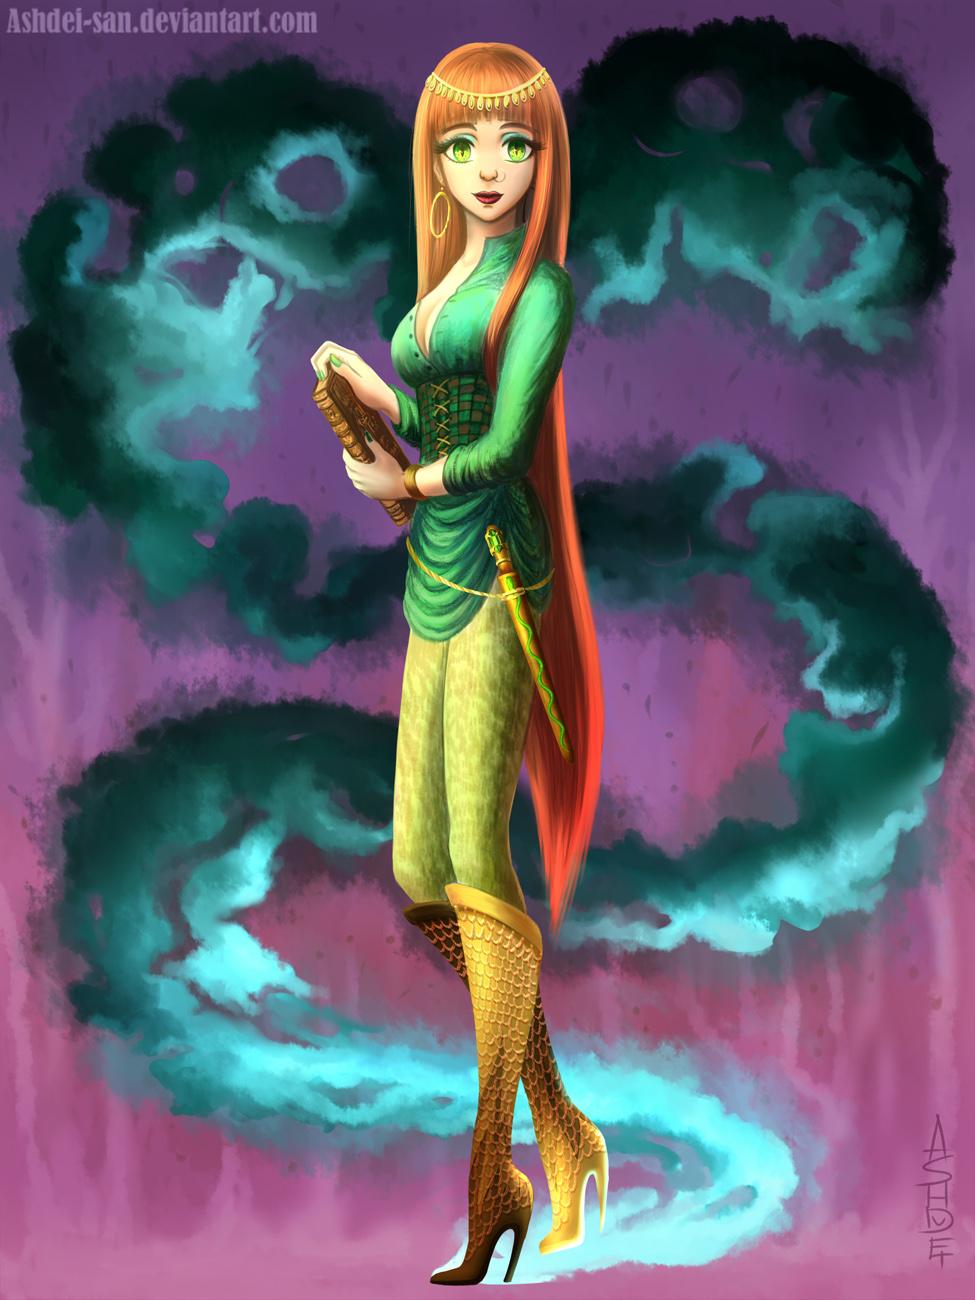 Definitely Slytherin by Ashdei-san